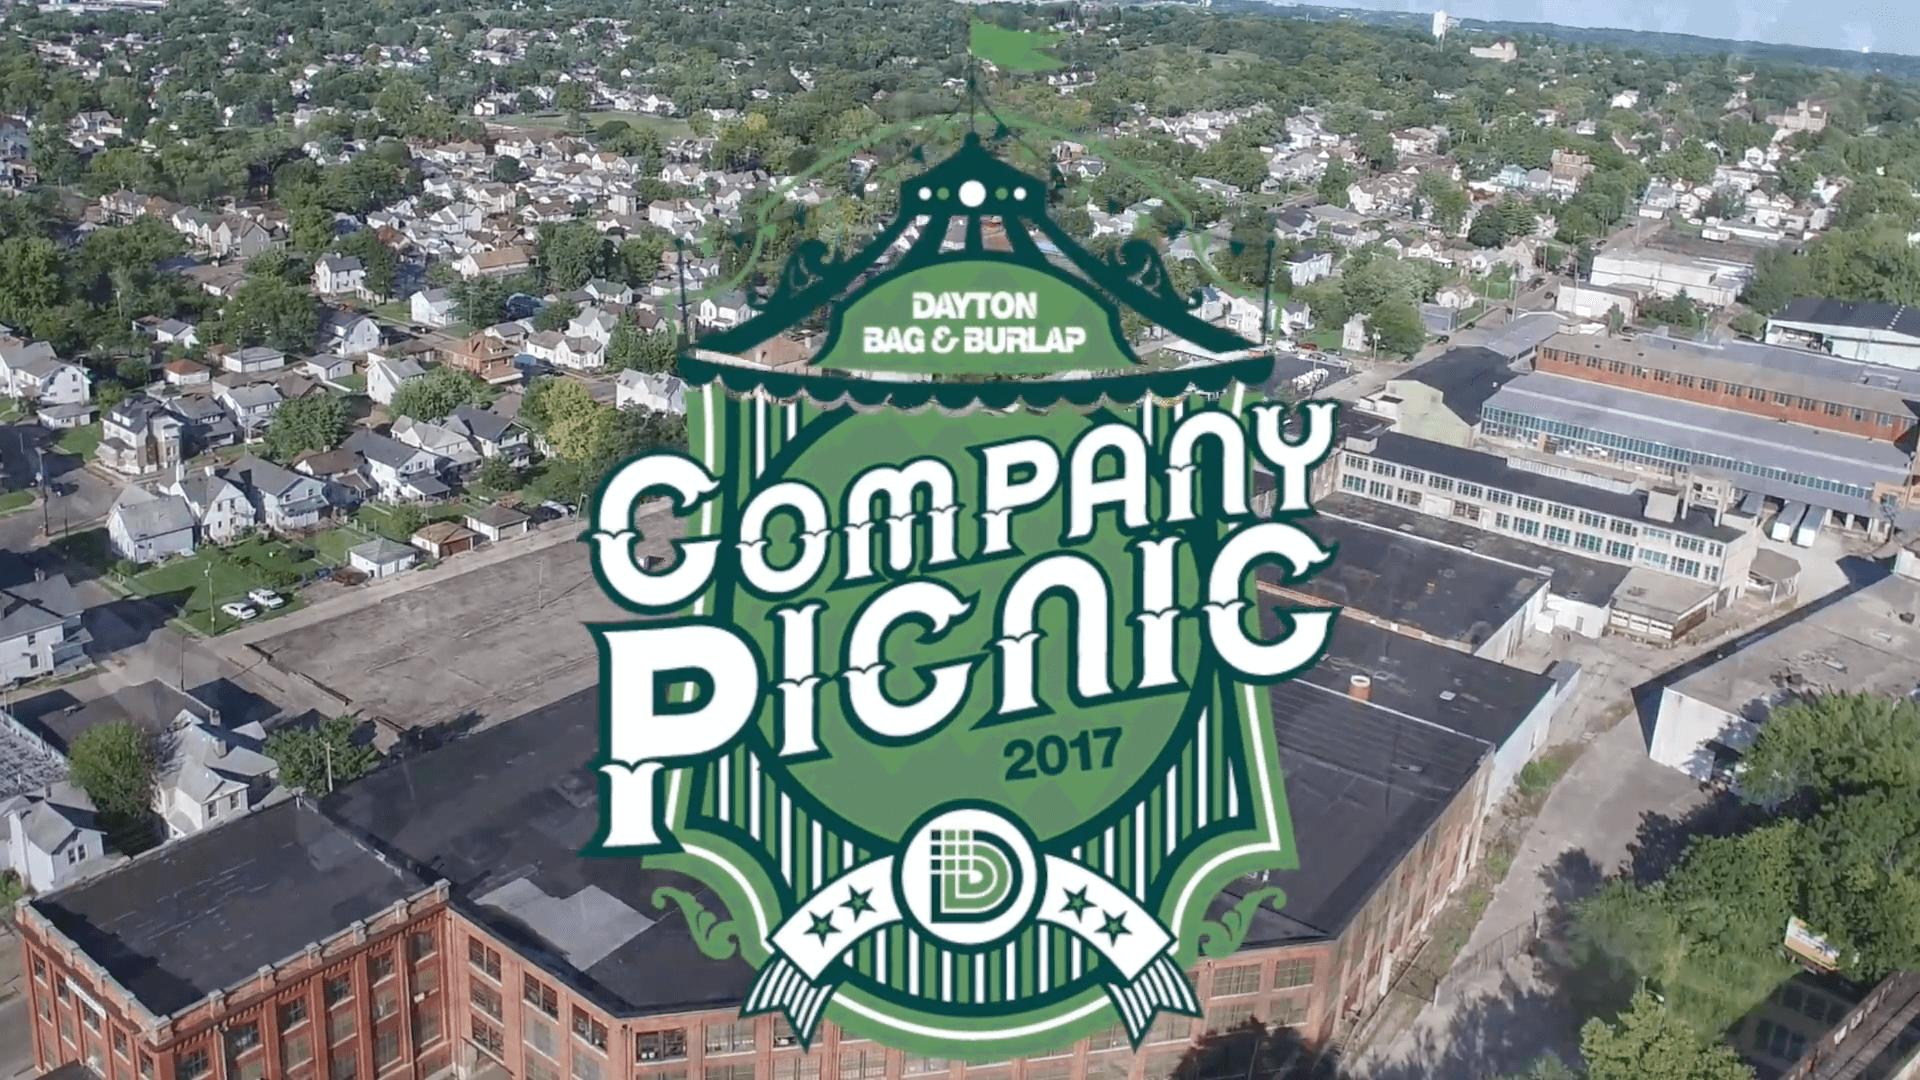 Dayton Bag Burlap Company Picnic 2017